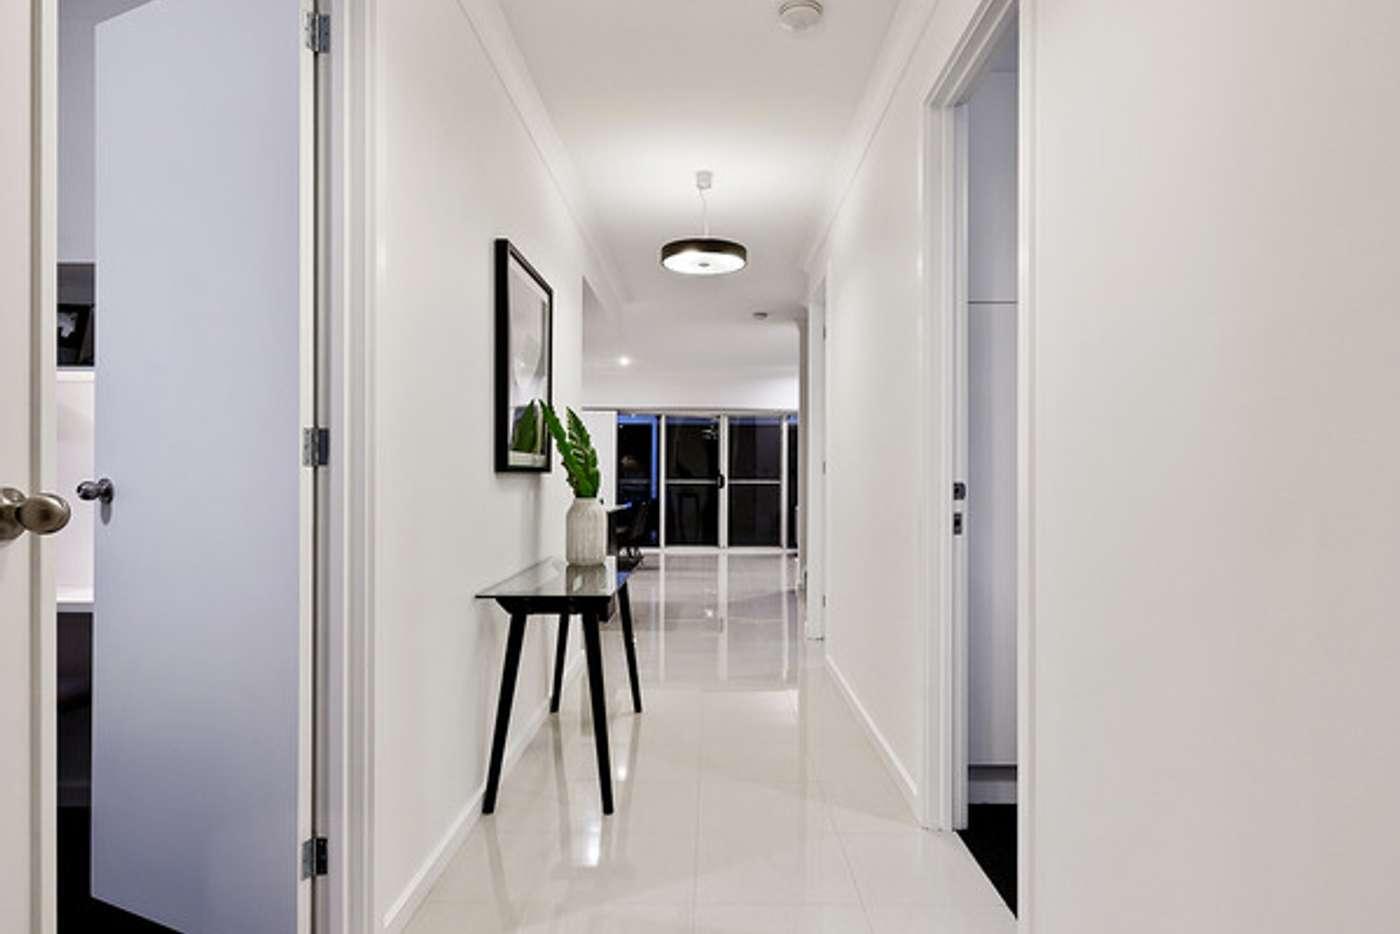 Fifth view of Homely house listing, 19 Maesbury Street, Kensington SA 5068